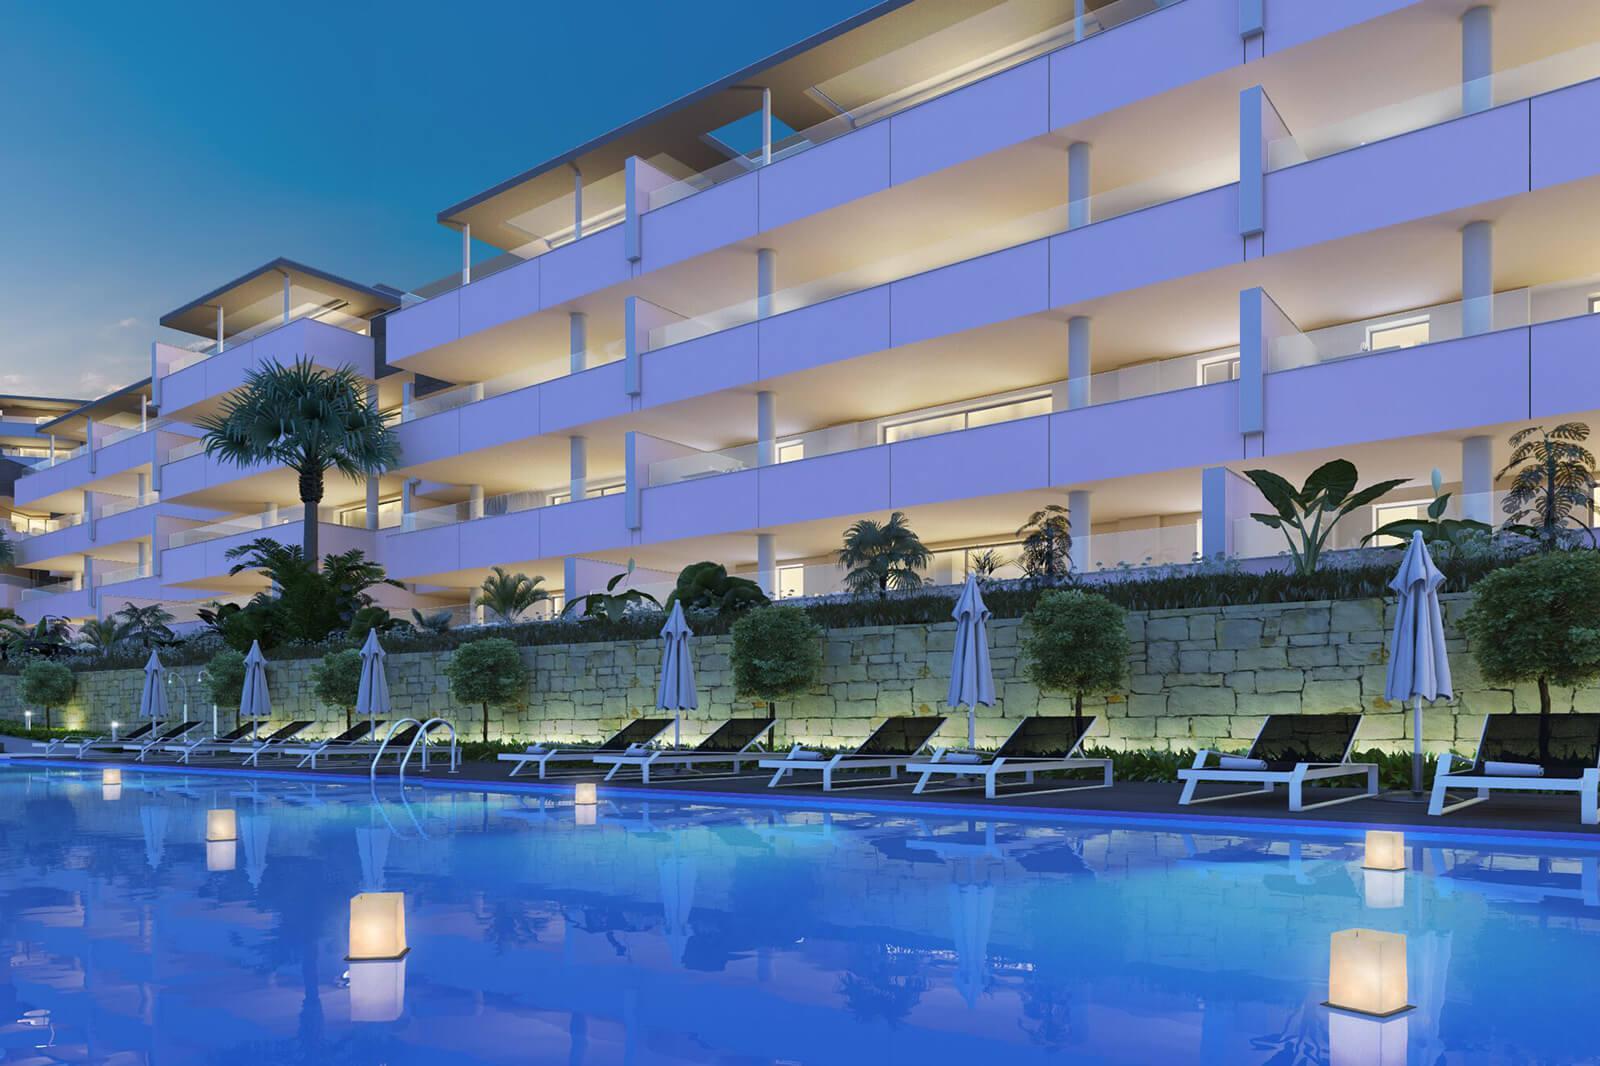 Penthouses for sale in Cortijo Blanco